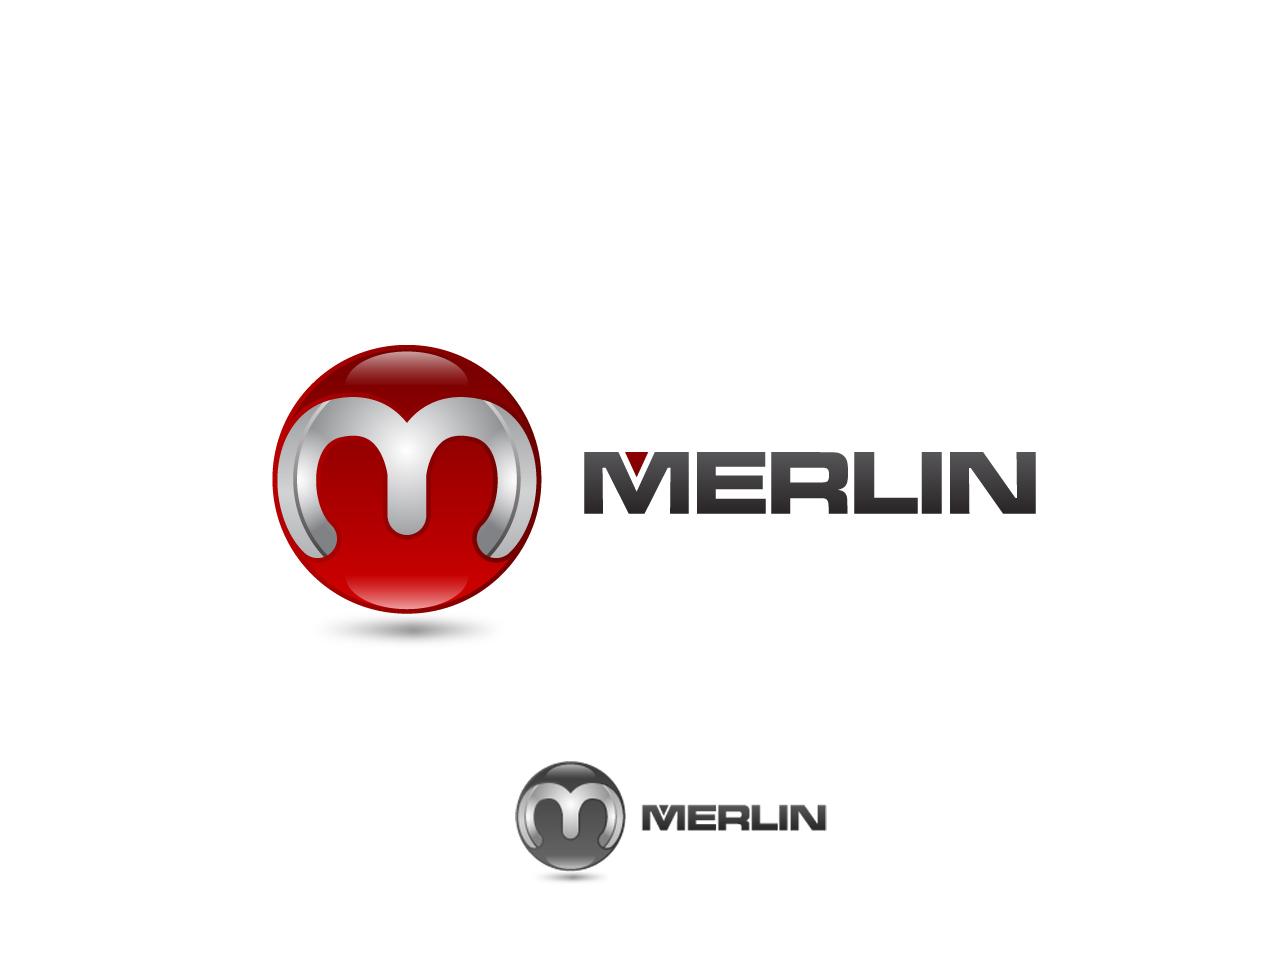 Logo Design by jpbituin - Entry No. 130 in the Logo Design Contest Imaginative Logo Design for Merlin.